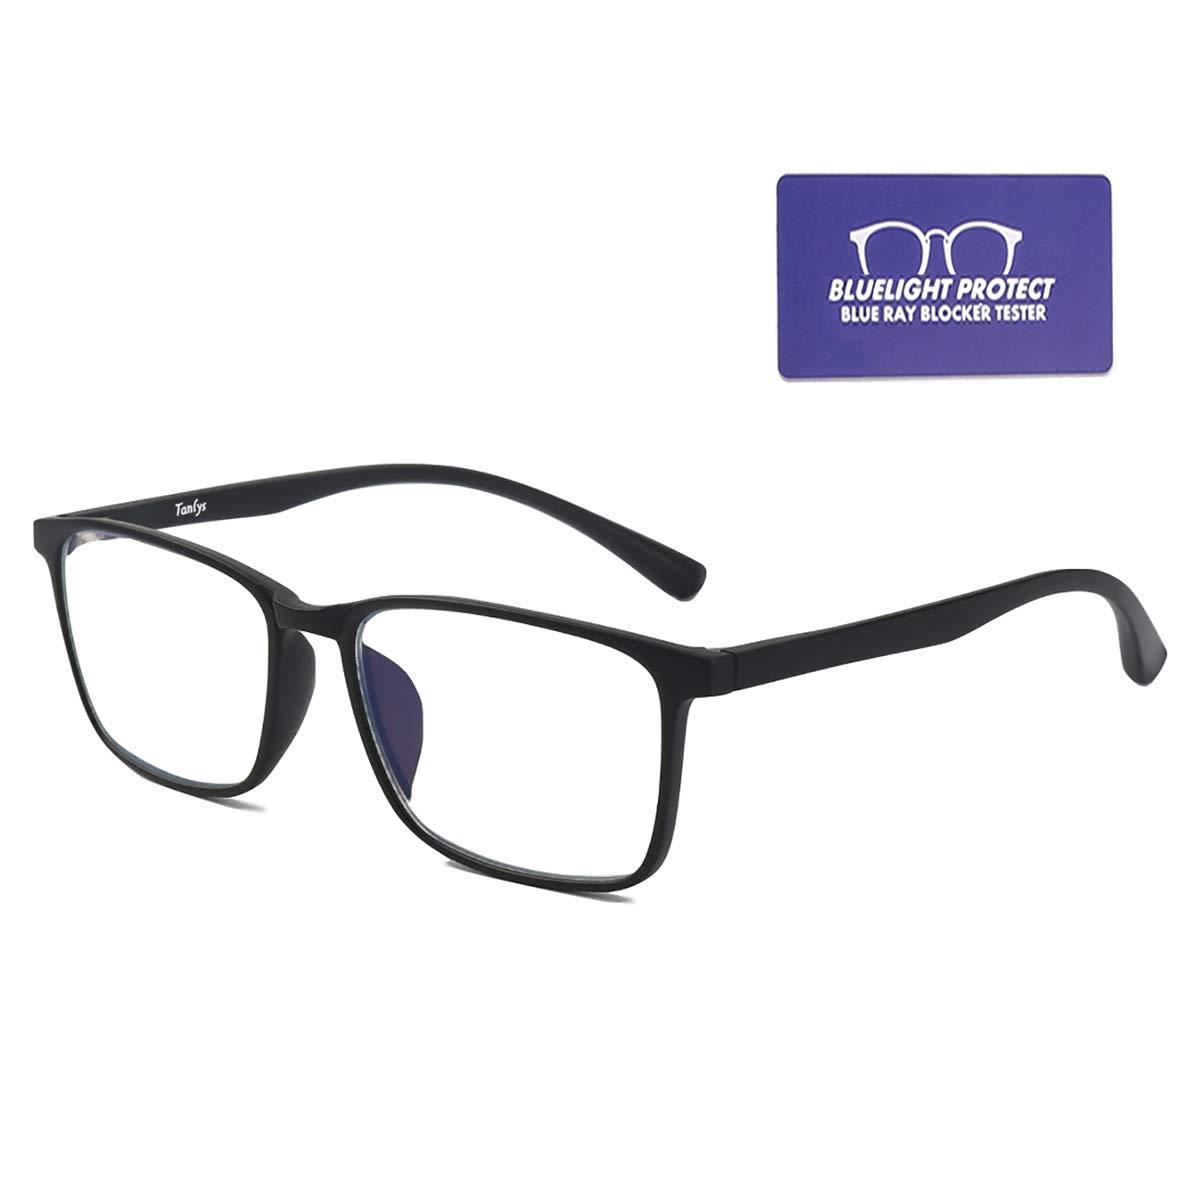 Tanlys Blue Light Blocking Glasses for Computer Eye Strain Anti UV Headache Light Weight TR90 Bluelight Blocker Gaming Glasses for Women Men(Black)